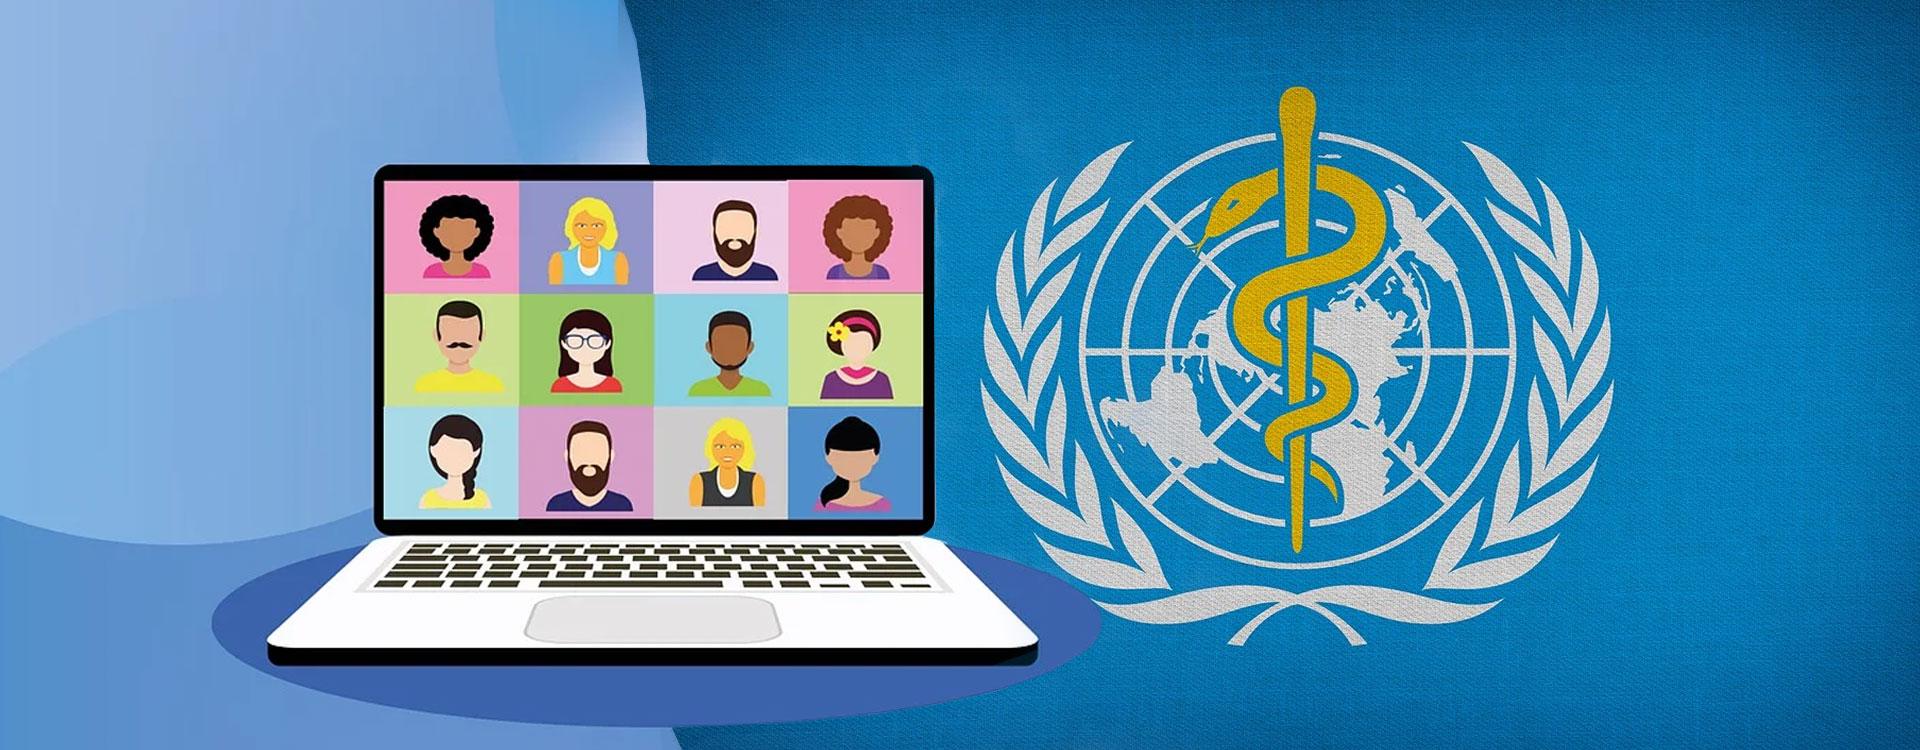 online meeting on a laptop next to World Health Organization logo